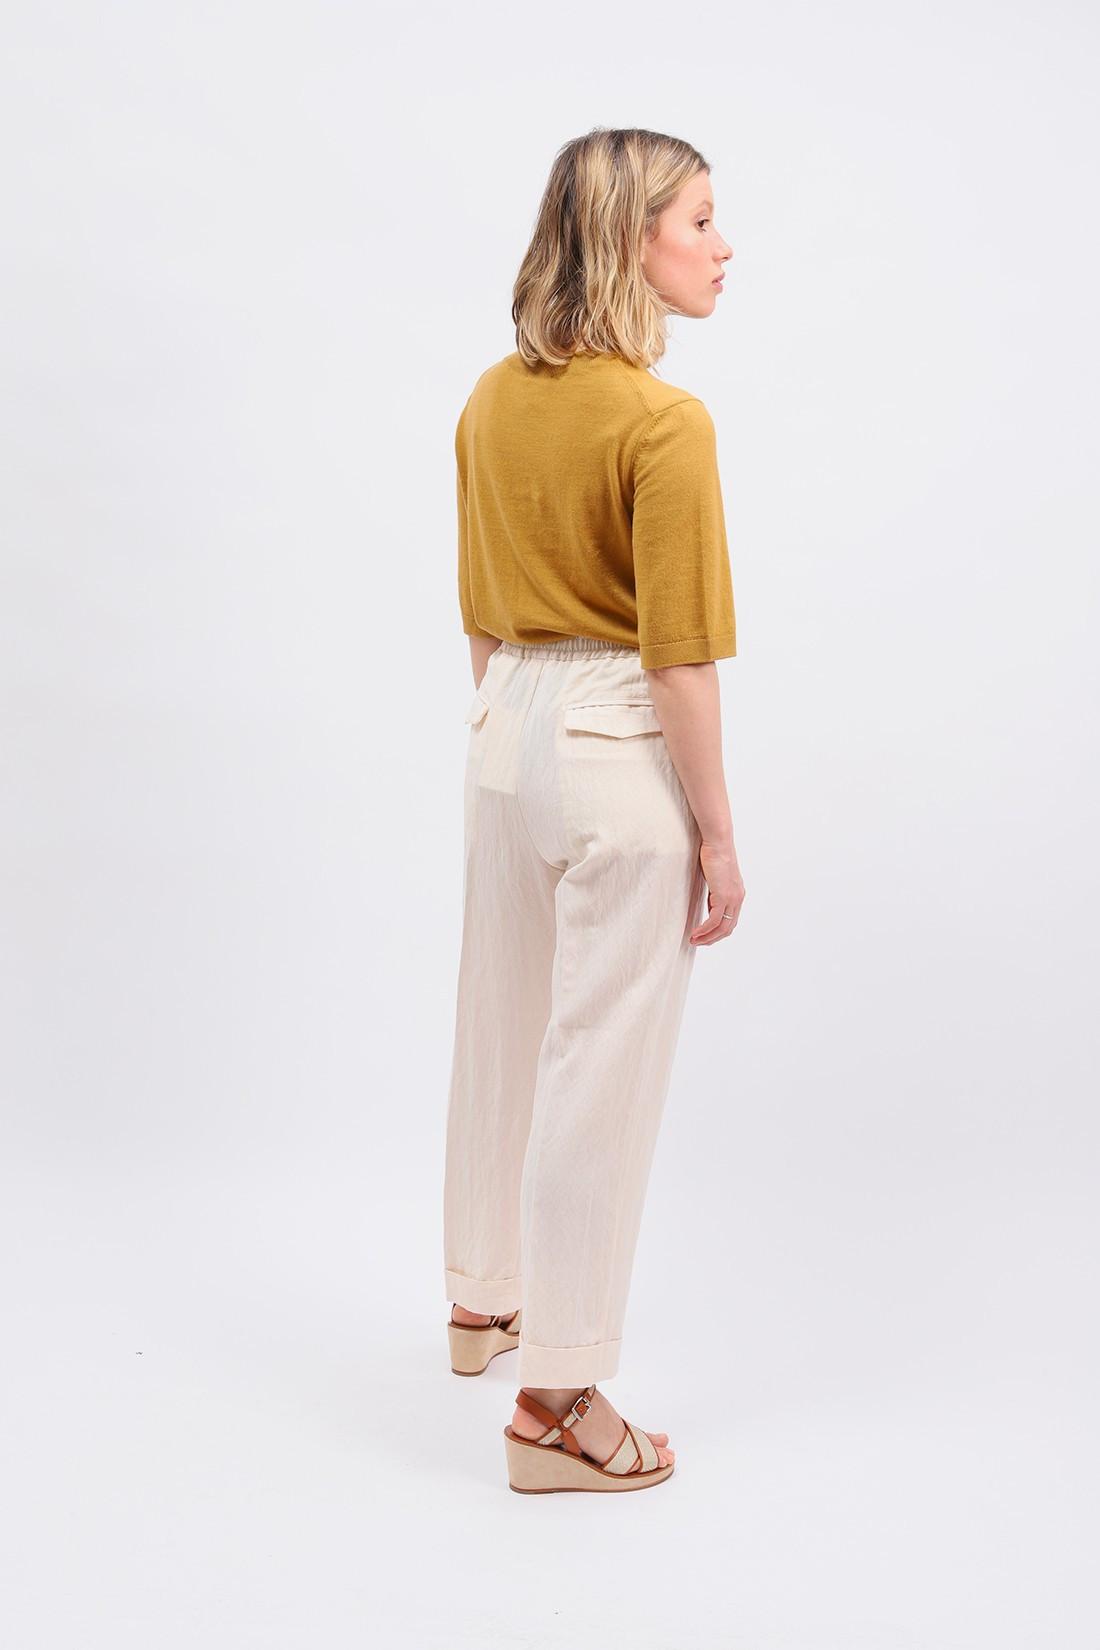 BARENA FOR WOMAN / Pantalone alfonso Avorio